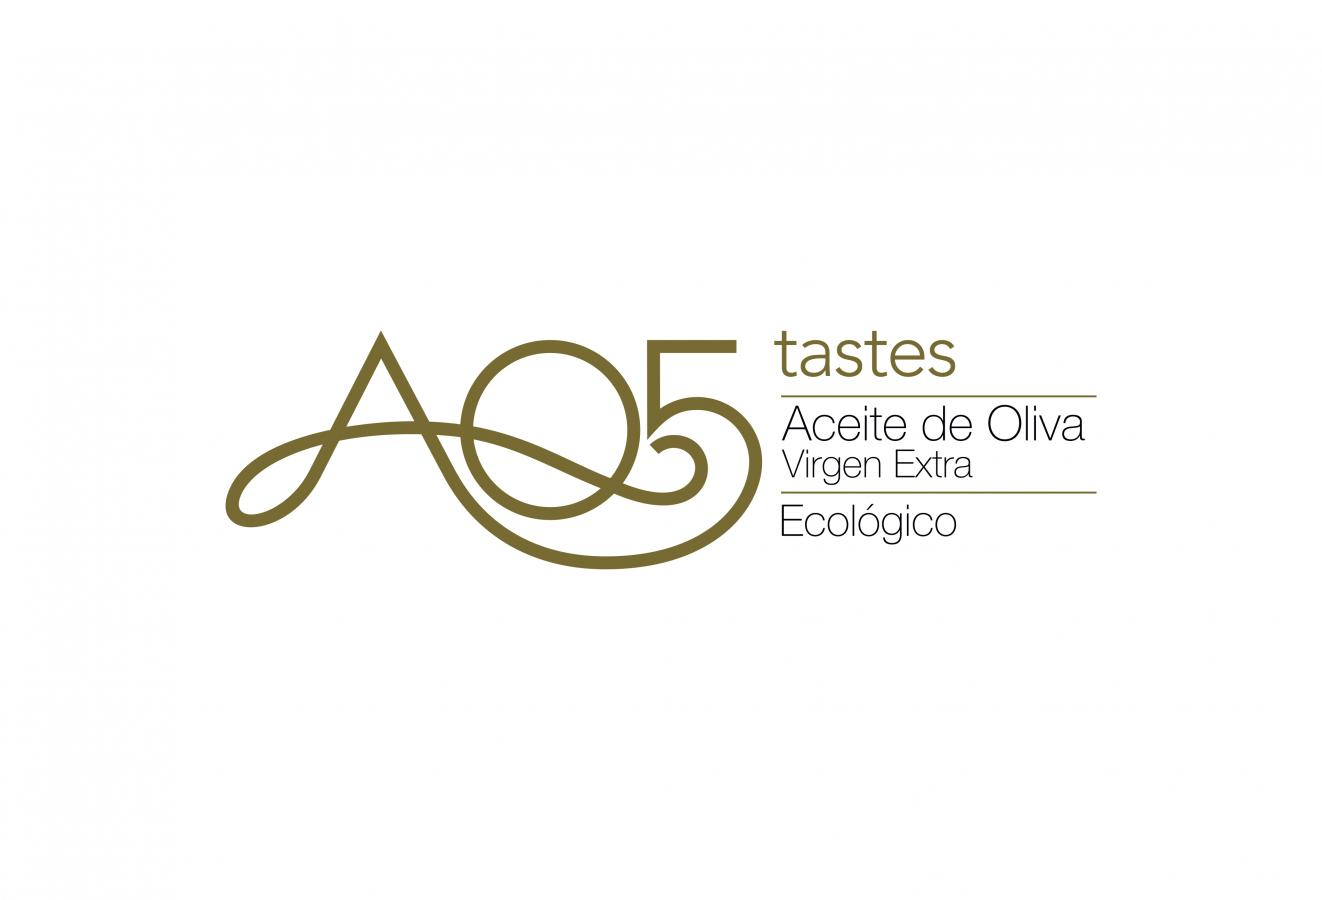 AQ5 Sabores